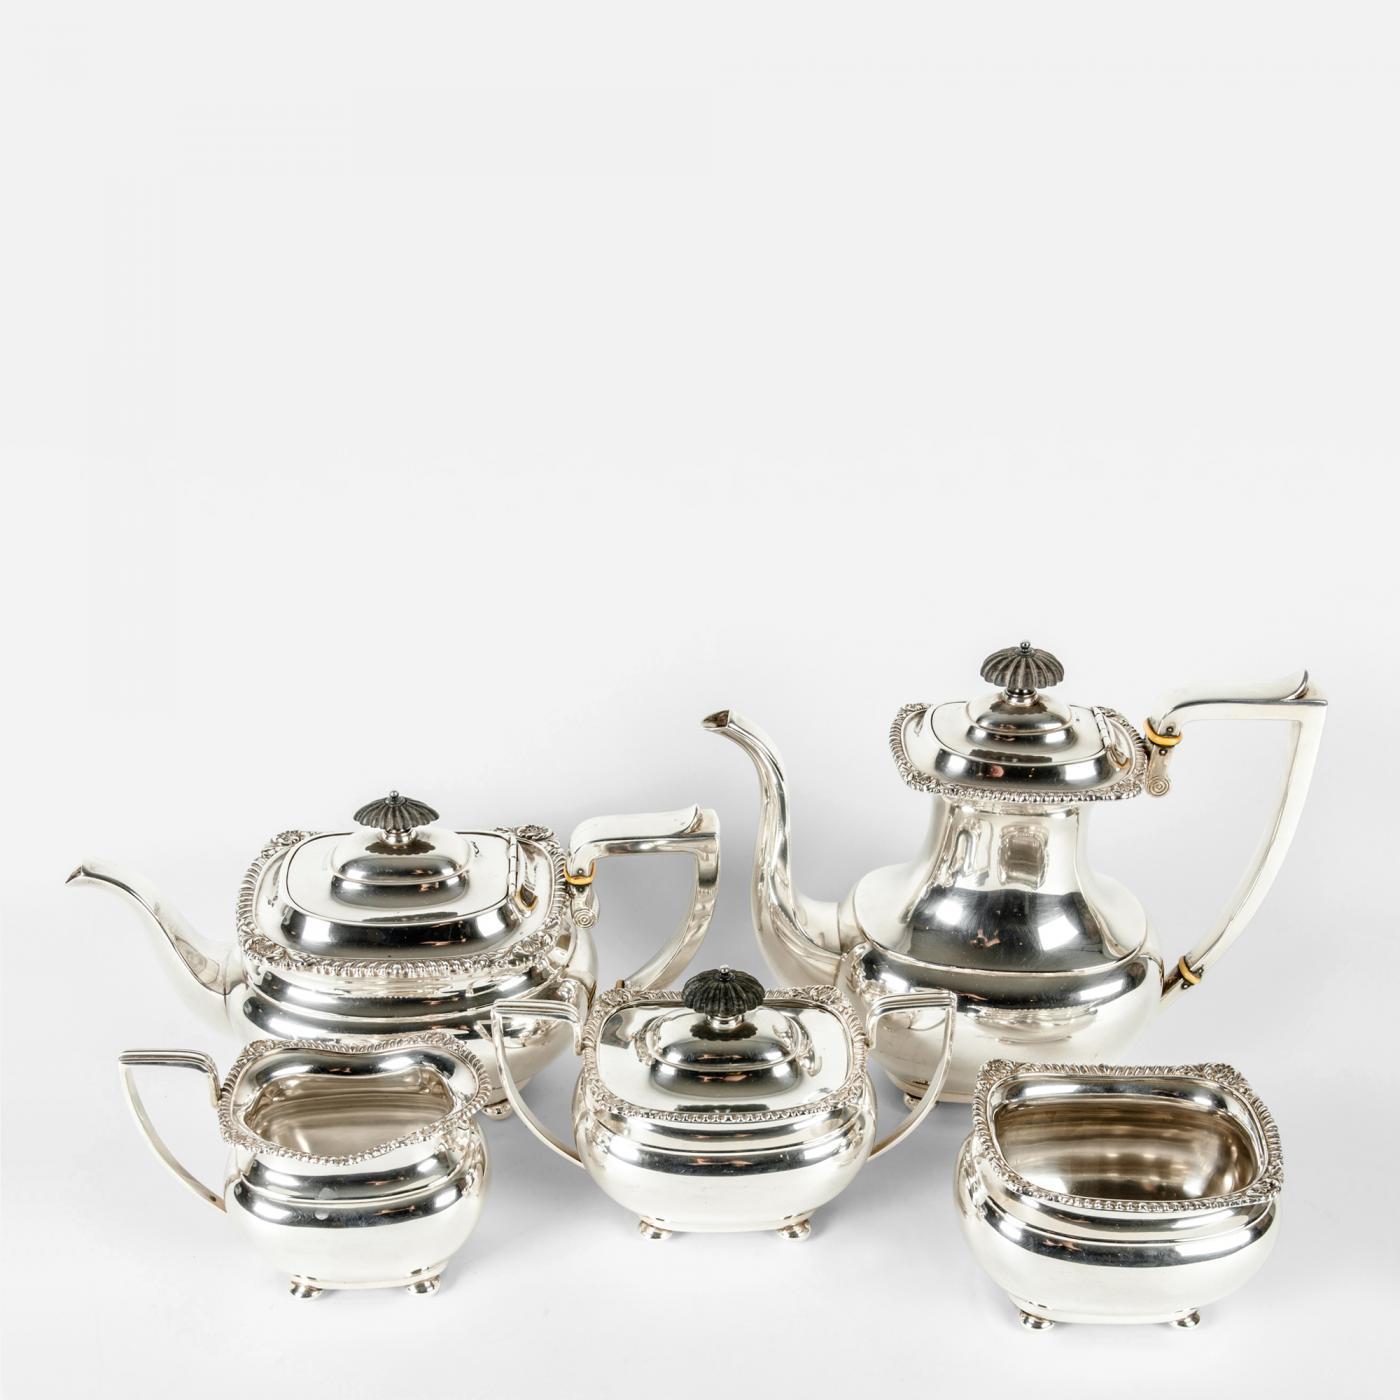 Encouraging Listings Decorative Arts Tablewares Coffee Tea Sets Silver Tea Coffee Service Silver Tea Set Worth Silver Tea Set Fb Rogers baby Silver Tea Set